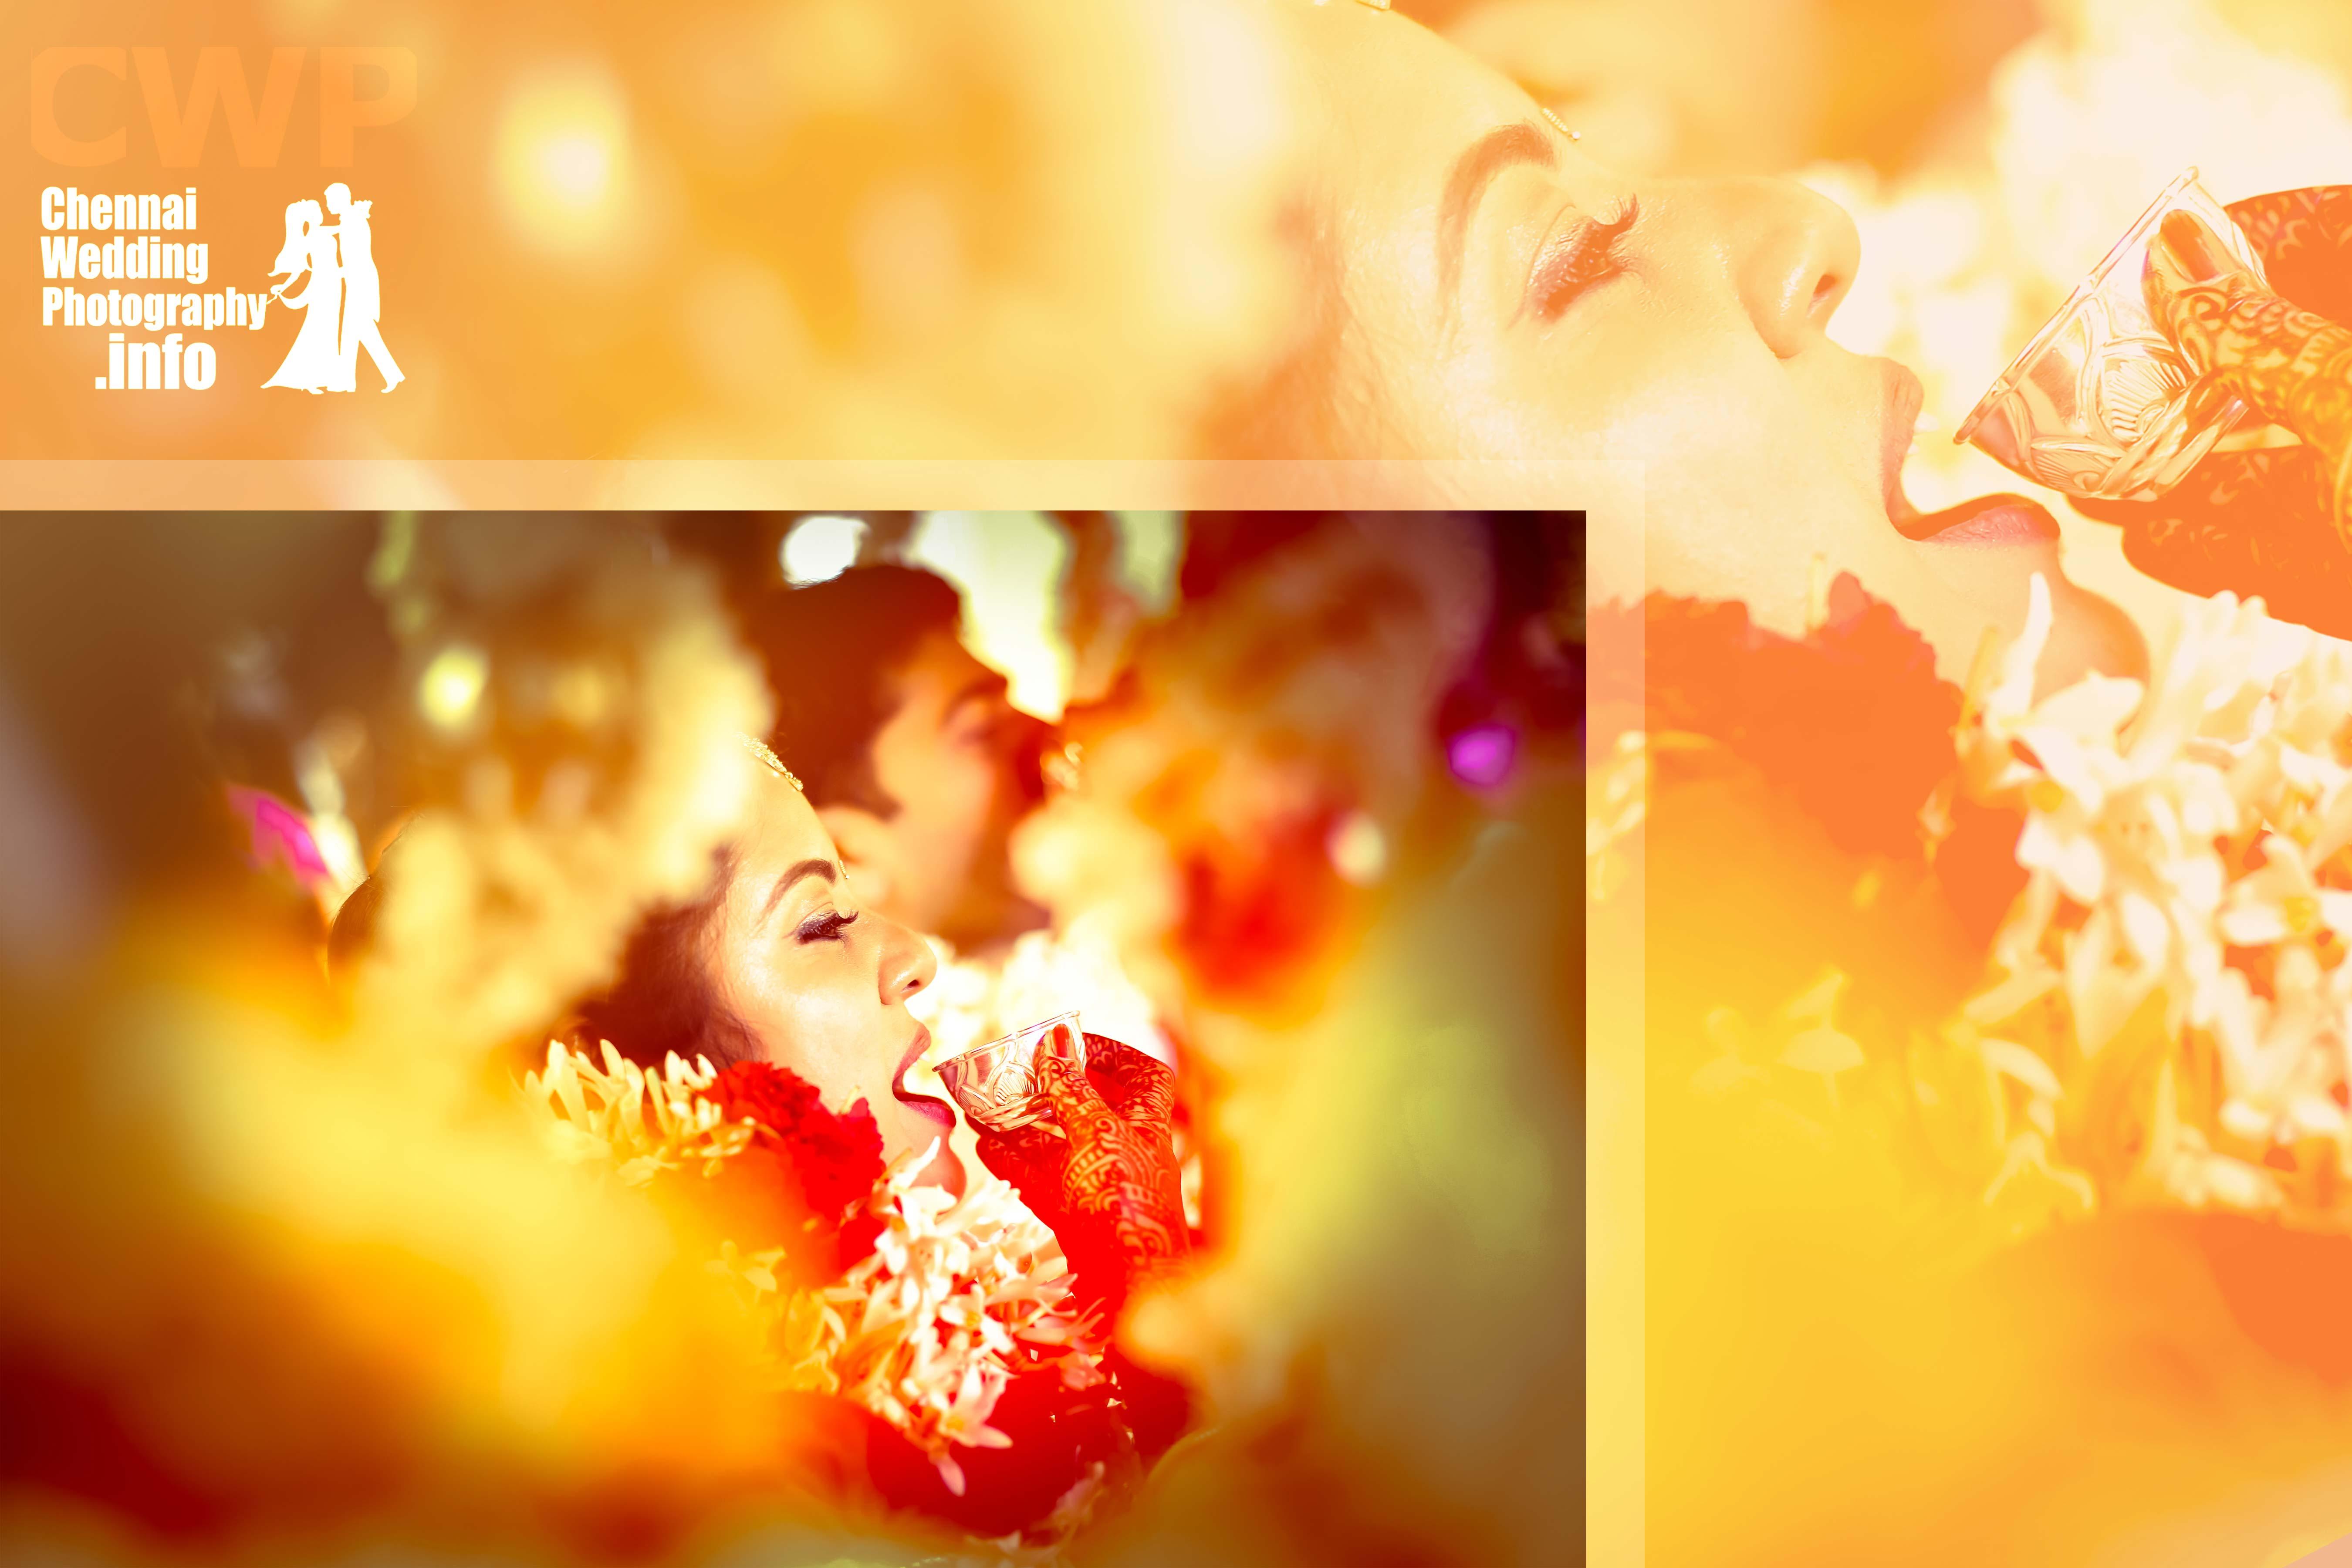 chennai brahmin wedding photographer